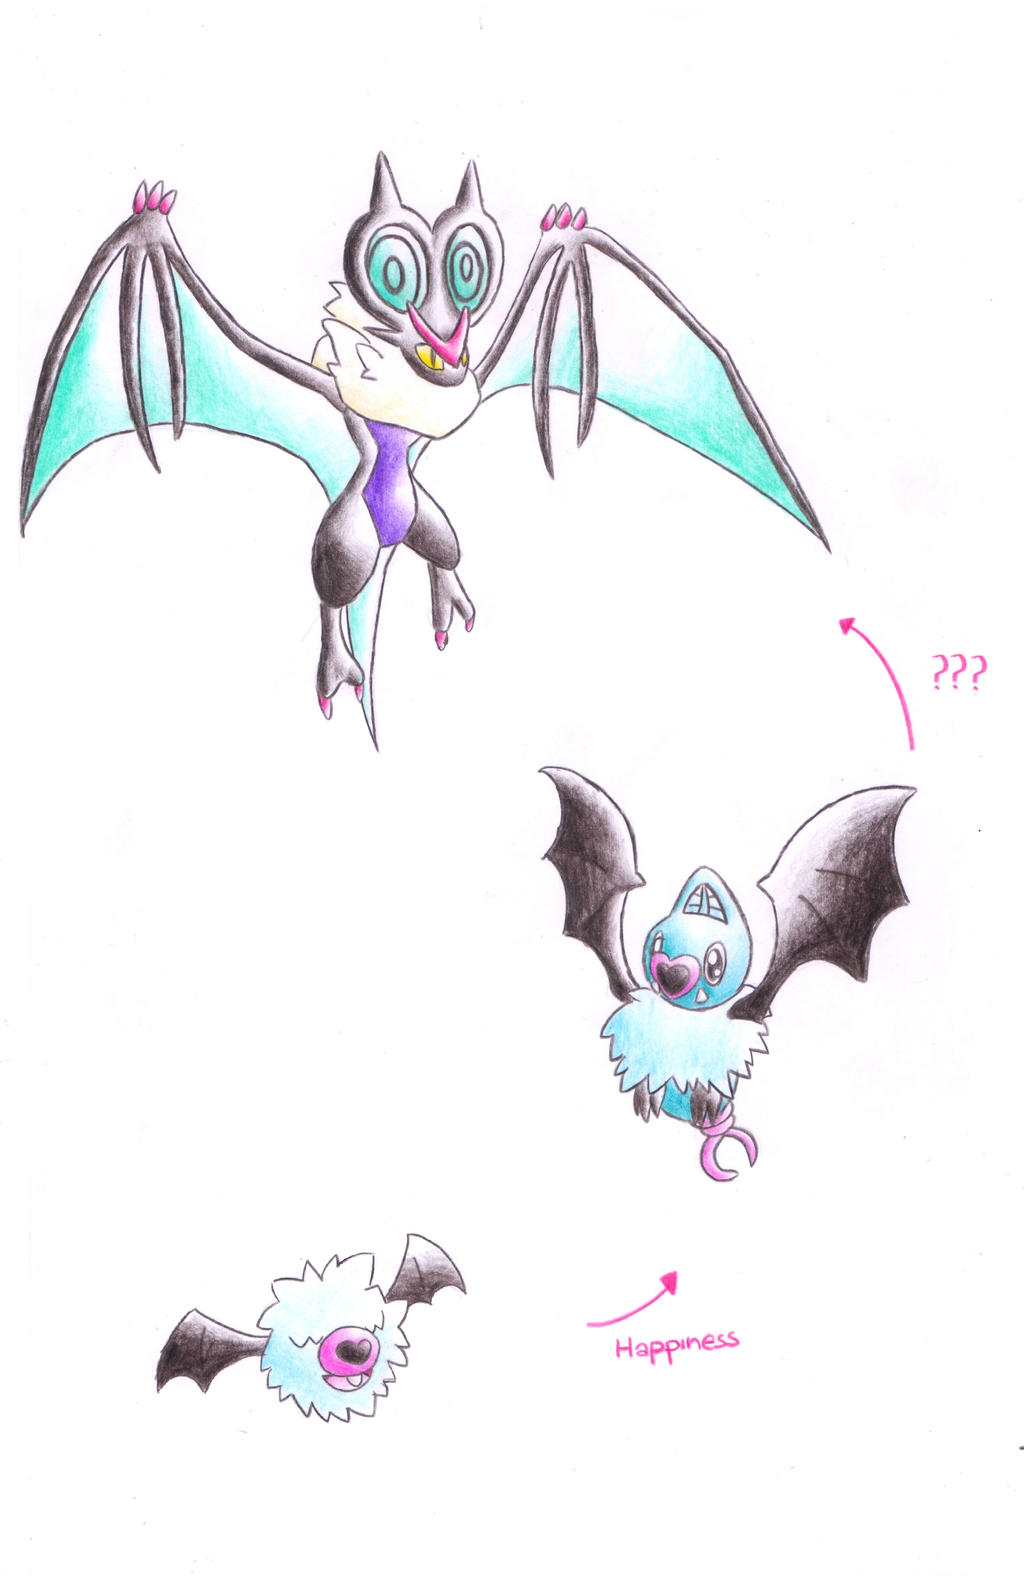 Pokemon Noivern Evolution Images